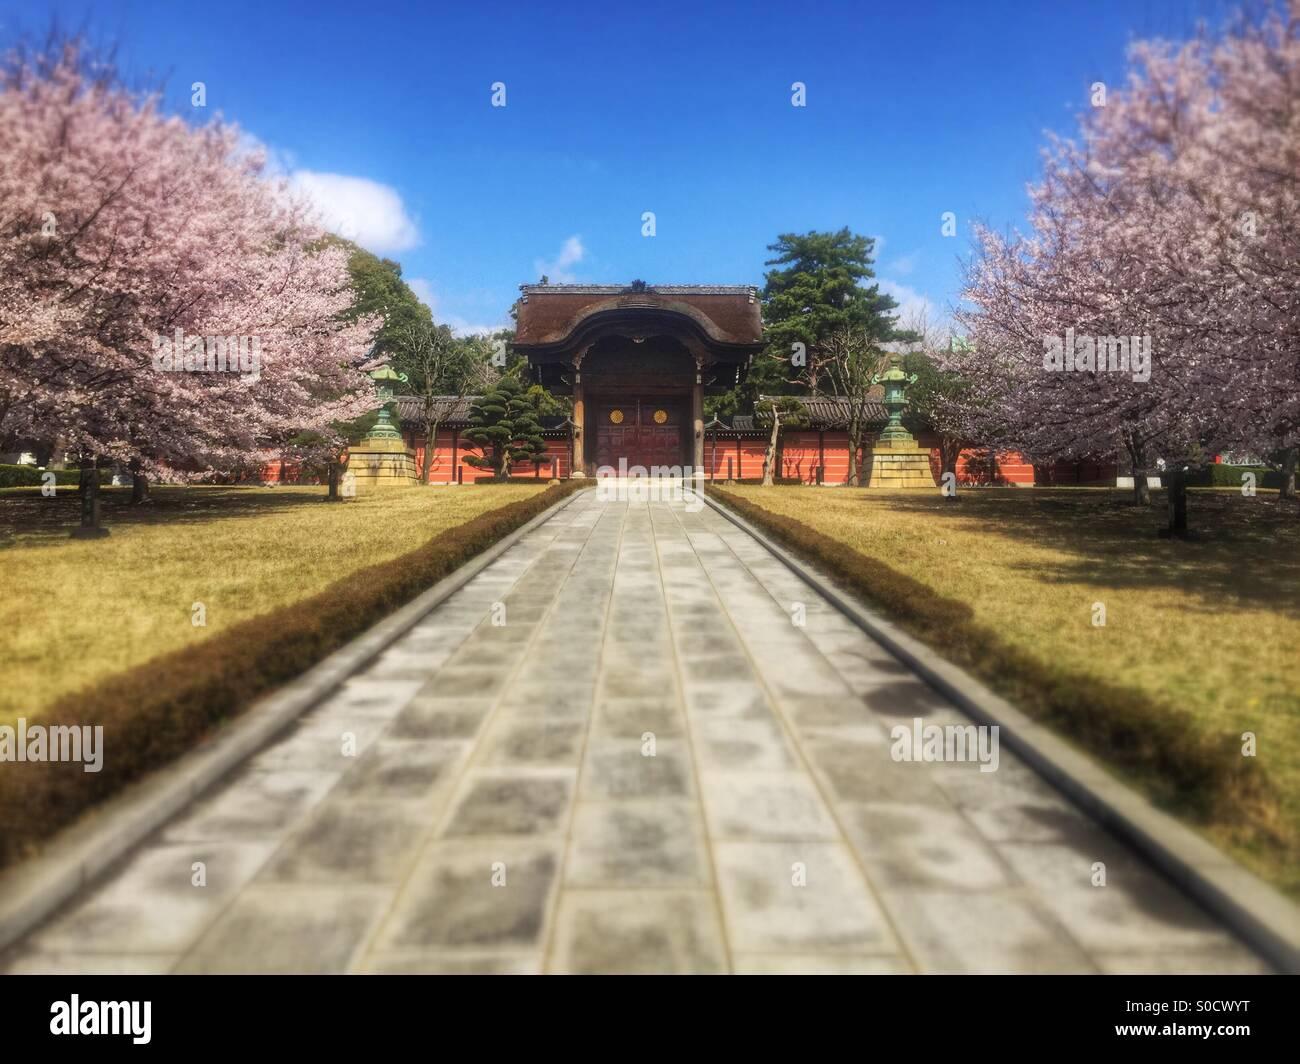 Karamon or traditional gate at Soji-ji, a Buddhist temple in Tsurumi Ward, Yokohama City, Japan, with sakura or - Stock Image